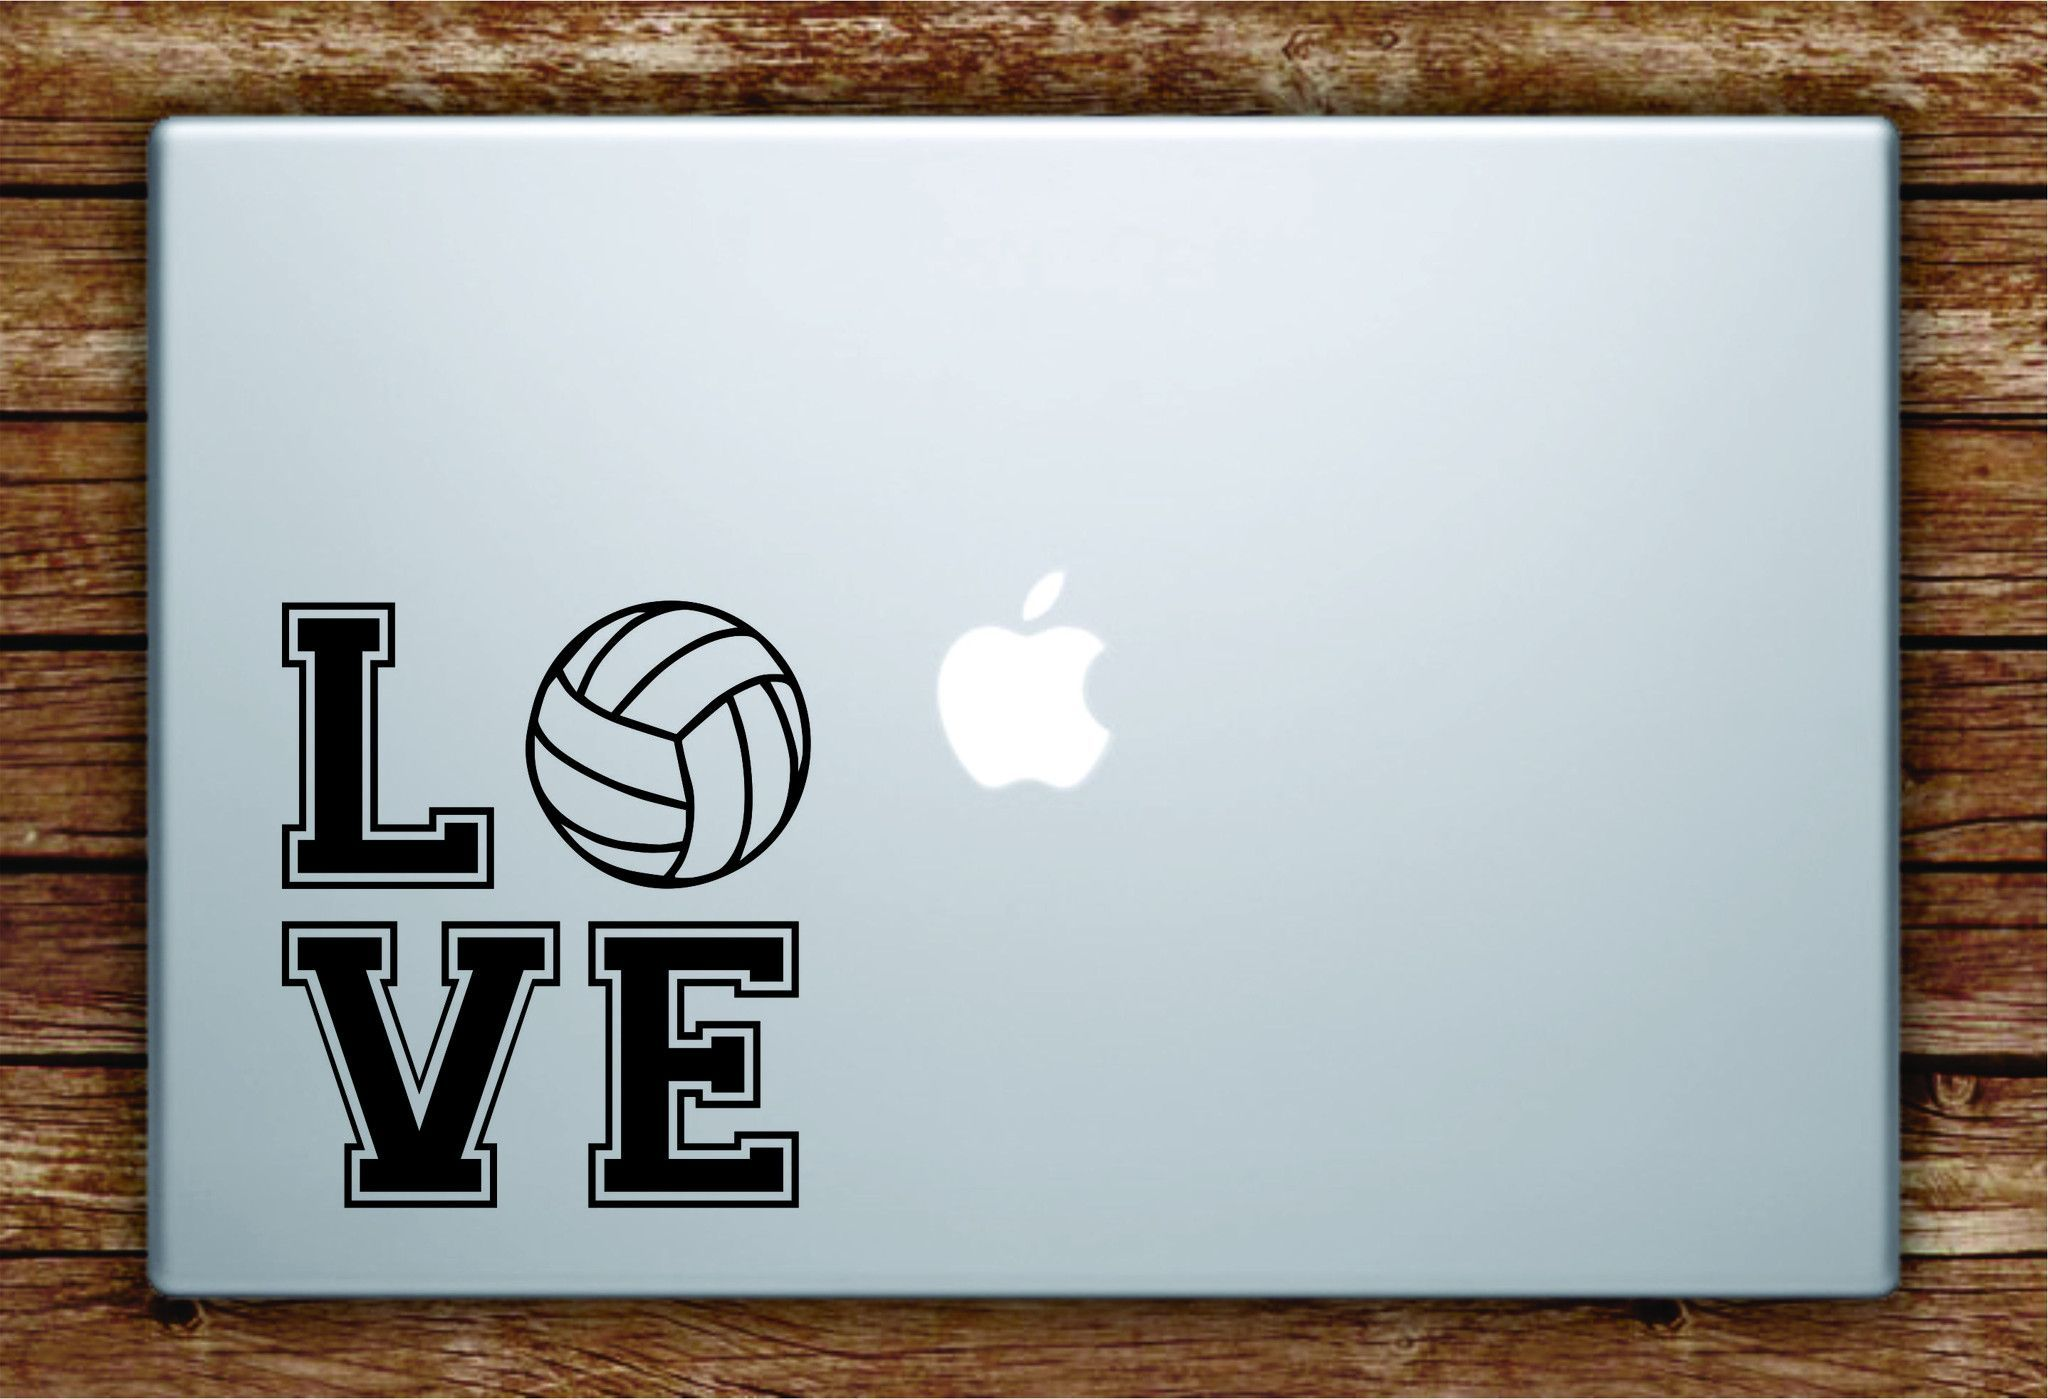 Love Volleyball Laptop Decal Sticker Vinyl Art Quote Macbook Apple Decor Sports Vinyl Art Quotes Wall Decal Sticker Wall Quotes Decals